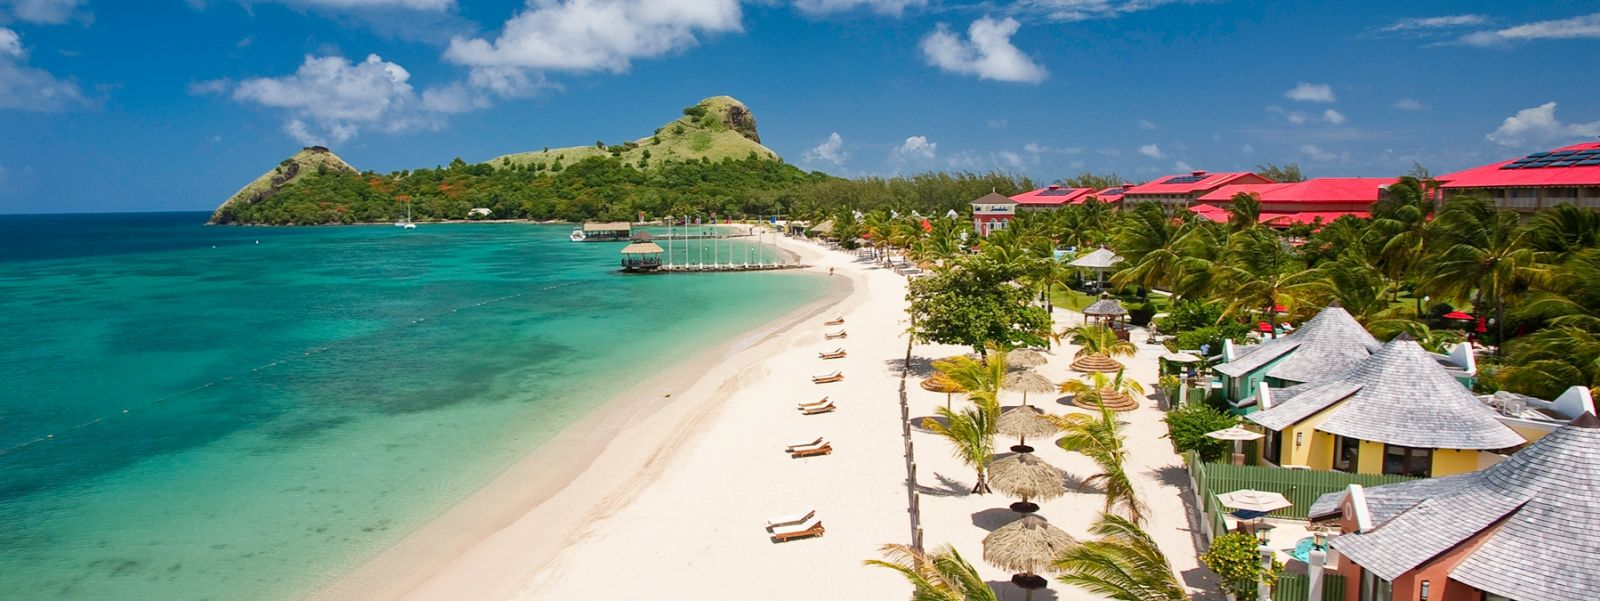 Coconut Beach St Lucia Reviews